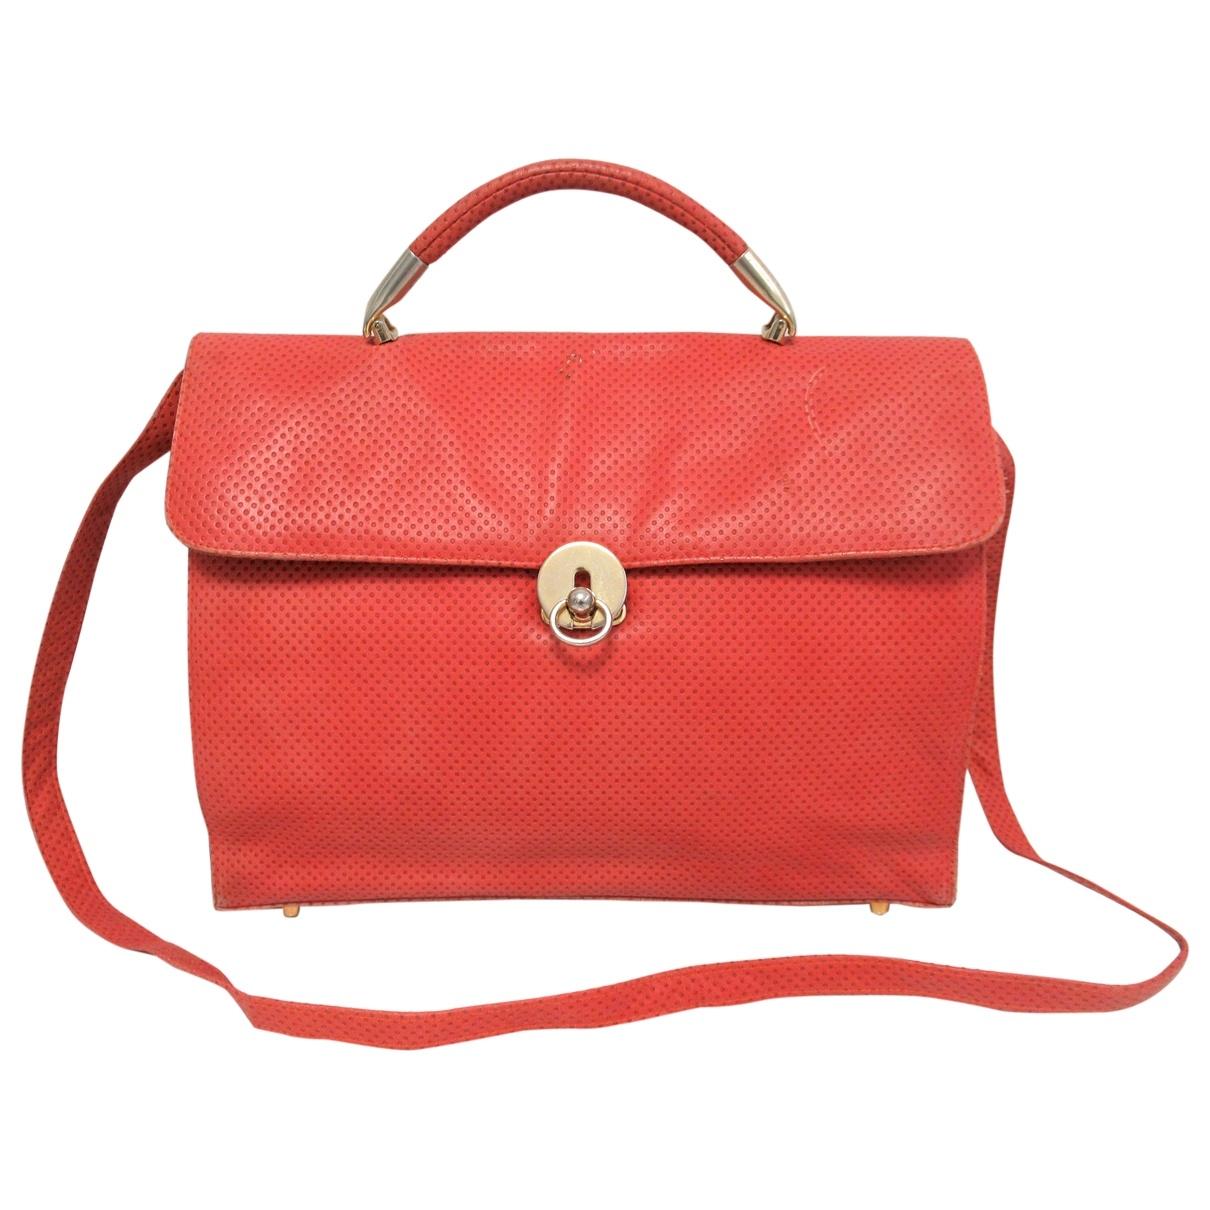 Charles Jourdan \N Handtasche in  Rot Leder